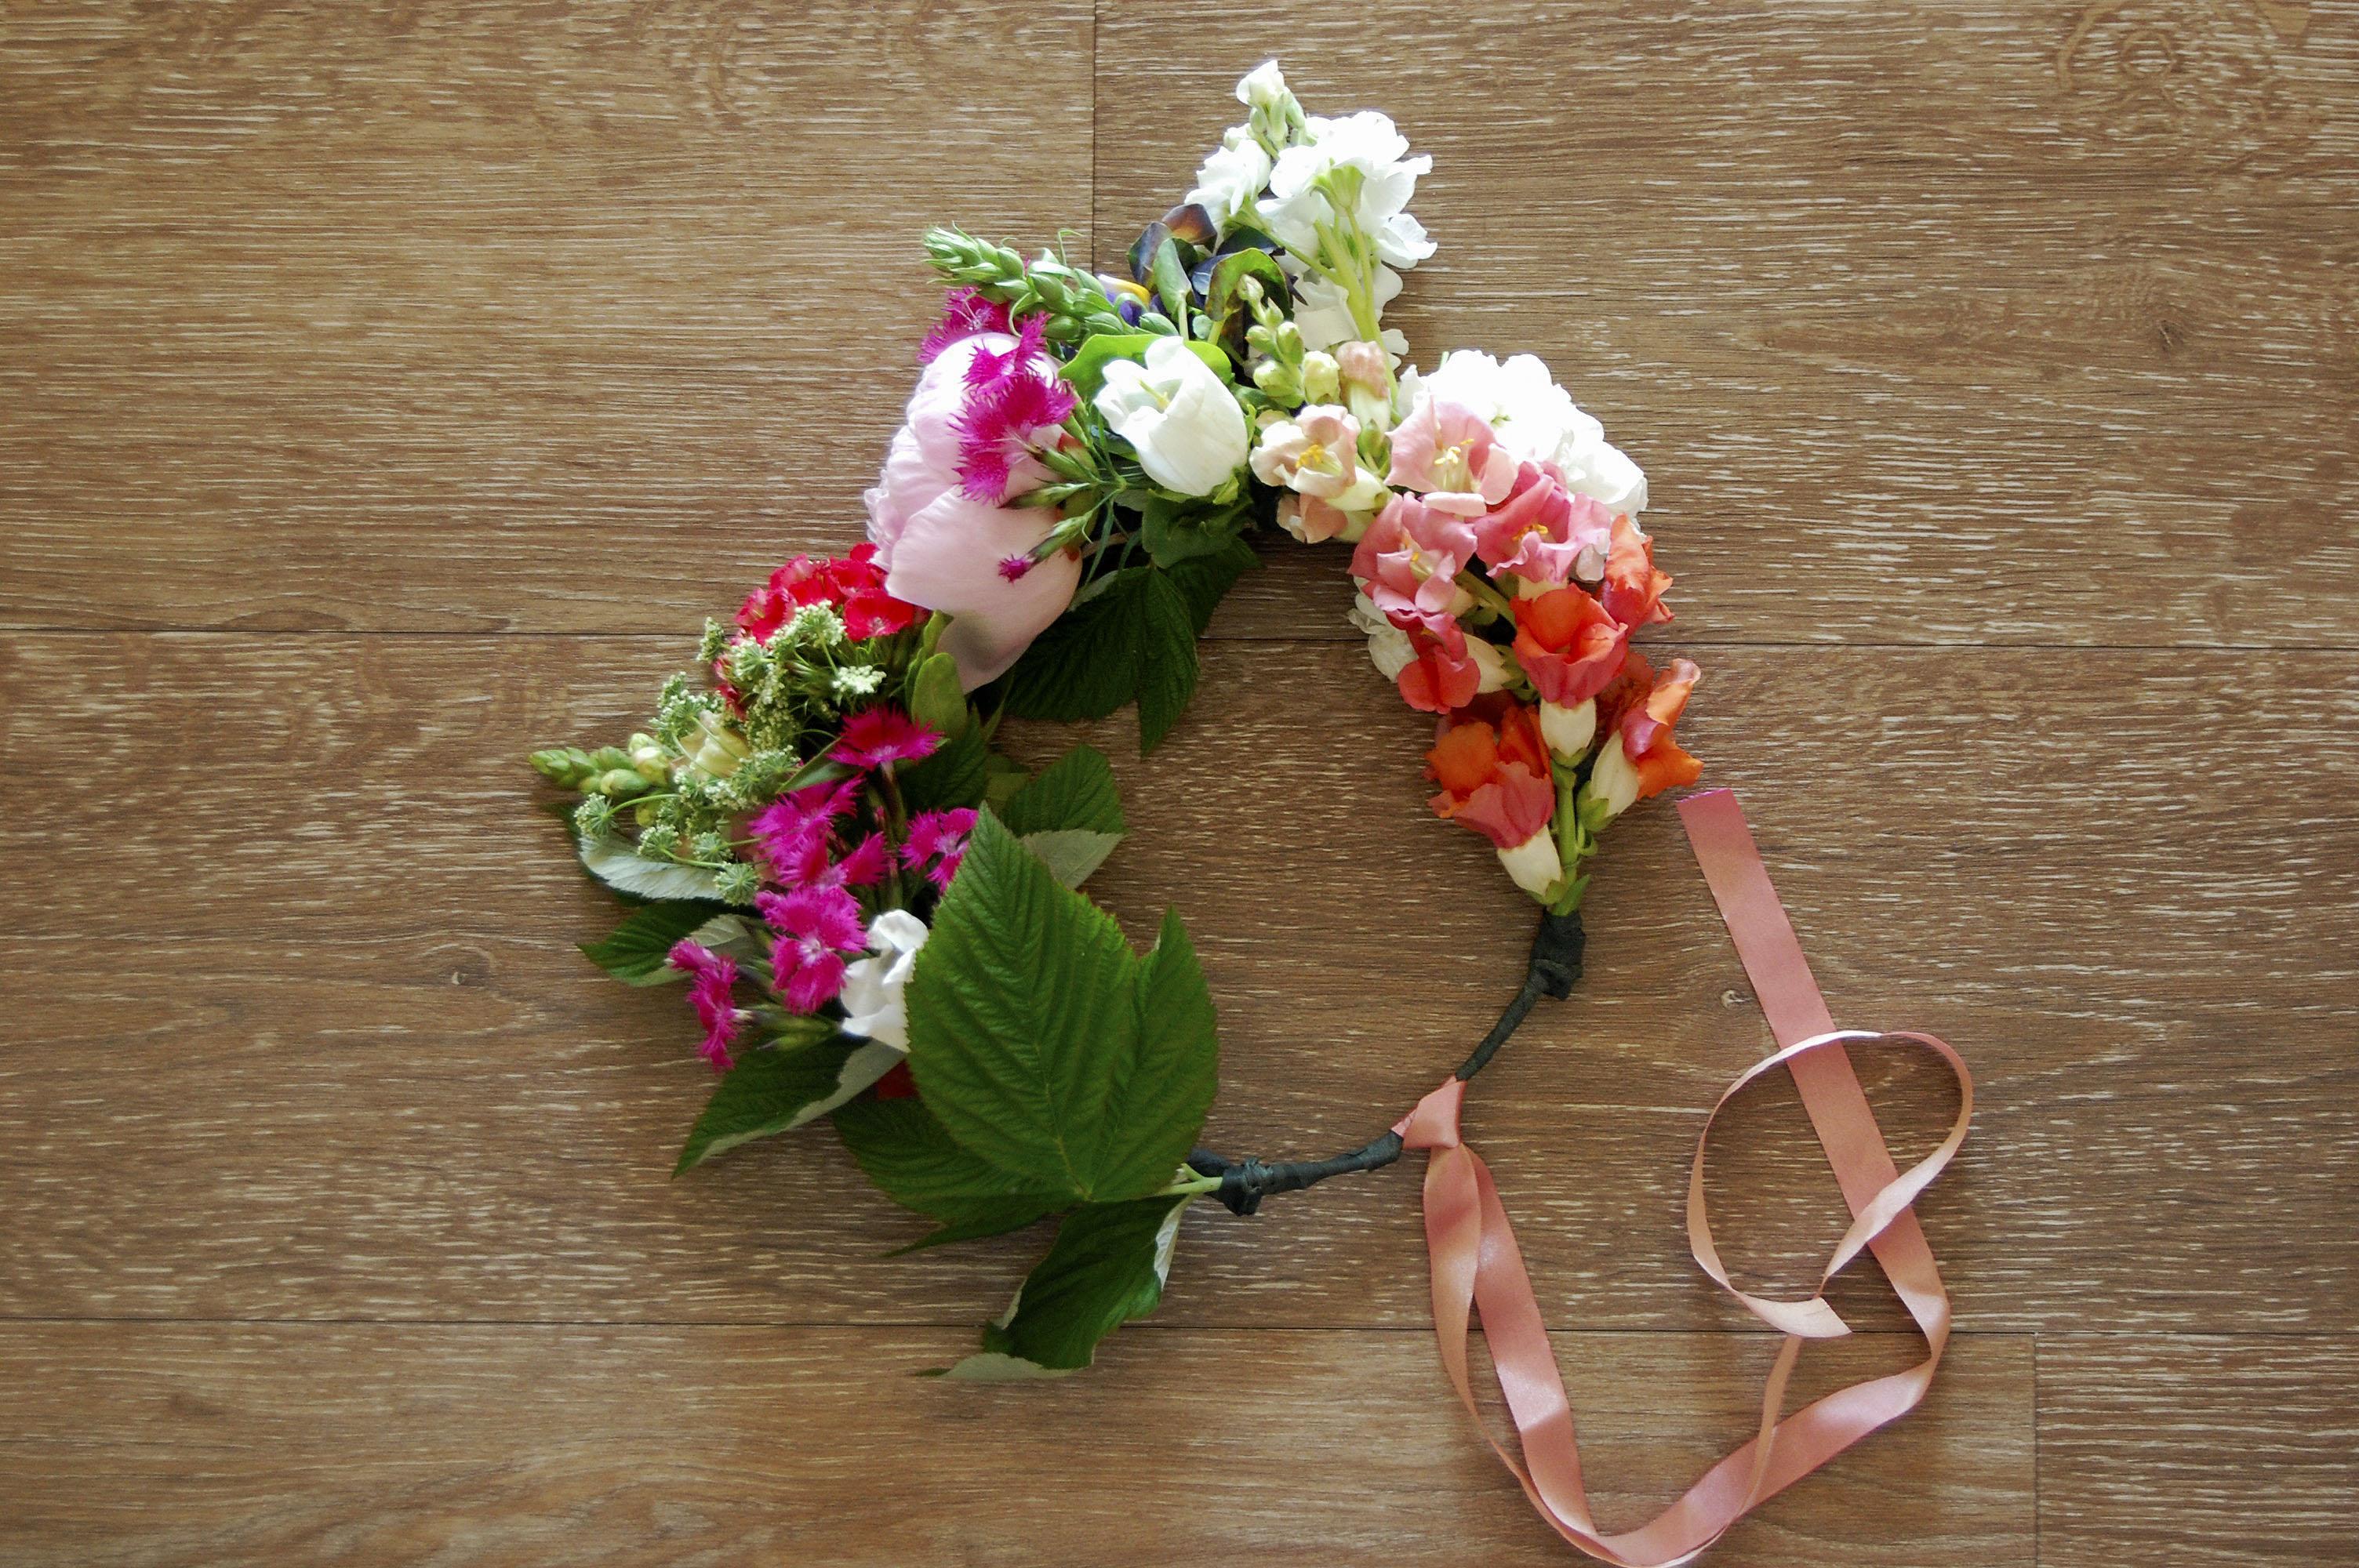 Diy floral crown with real flowers julias floral crown diy floral crown with real flowers izmirmasajfo